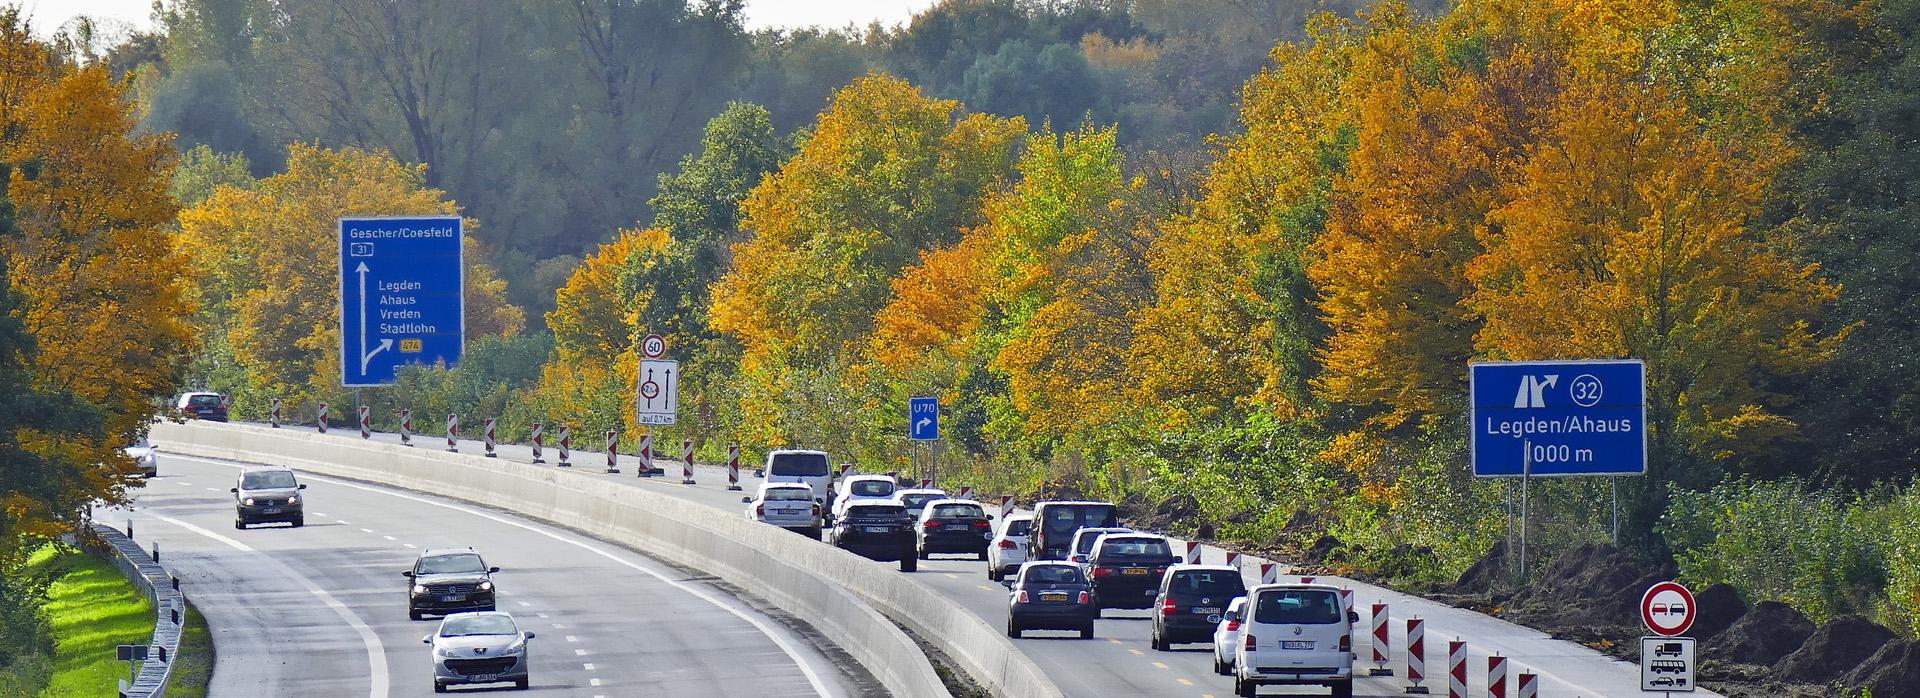 Autobahn A 31, Ausfahrt Legden